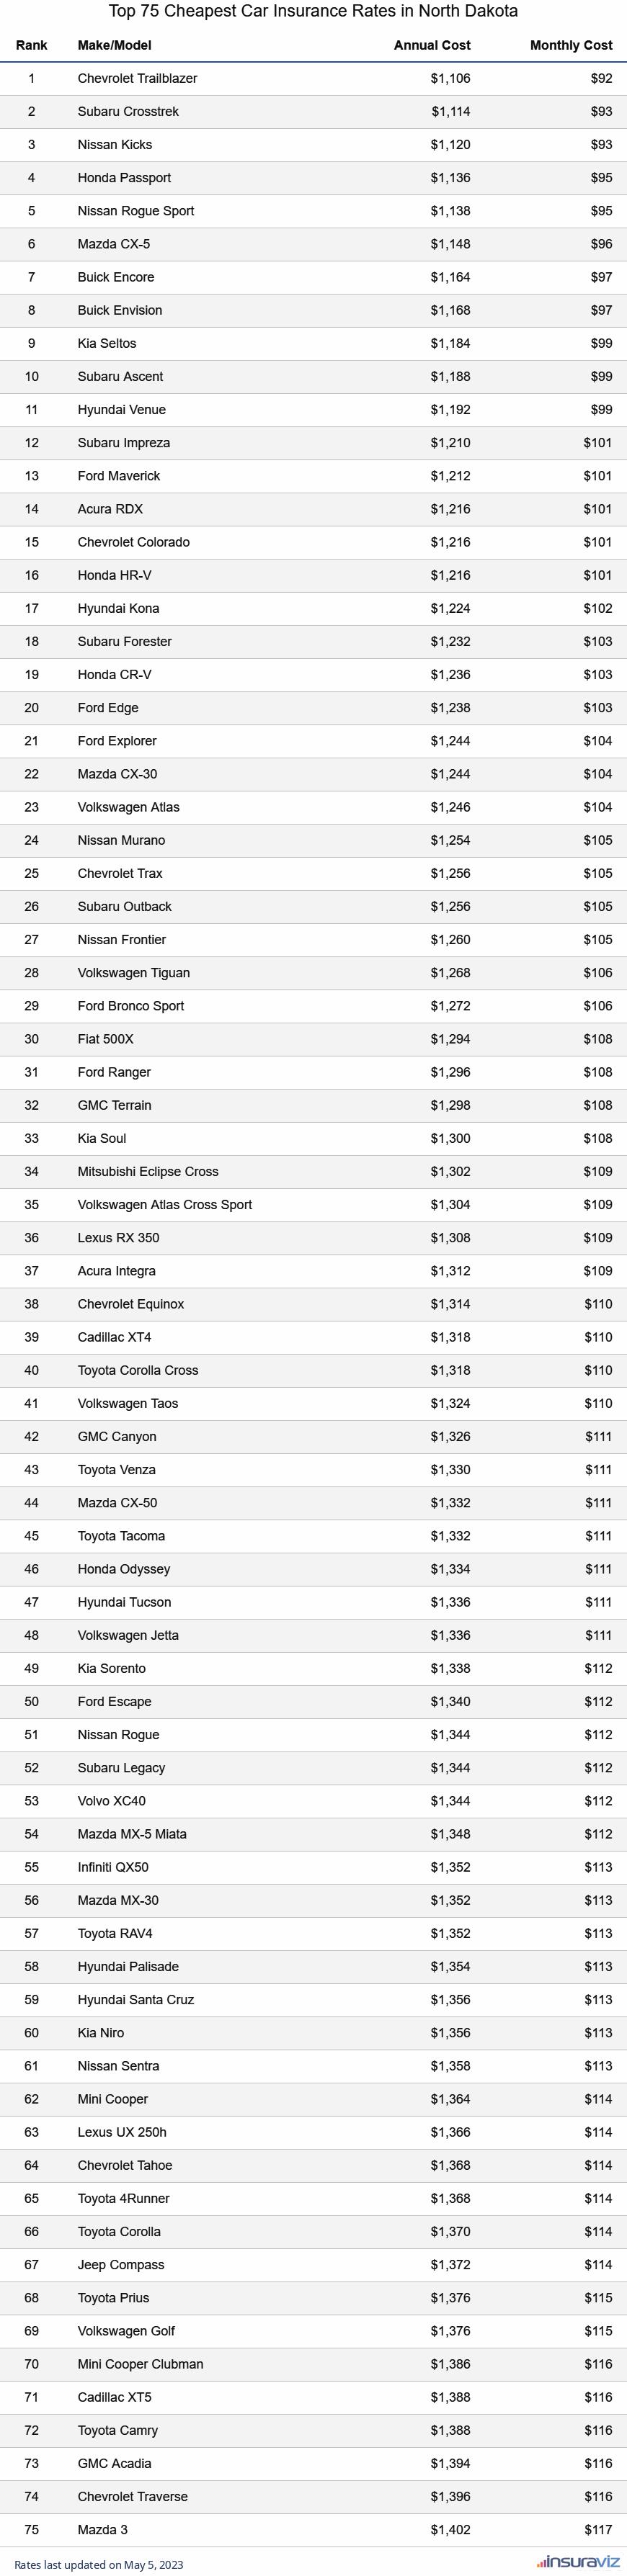 Top 75 Cheapest Car Insurance Rates in North Dakota